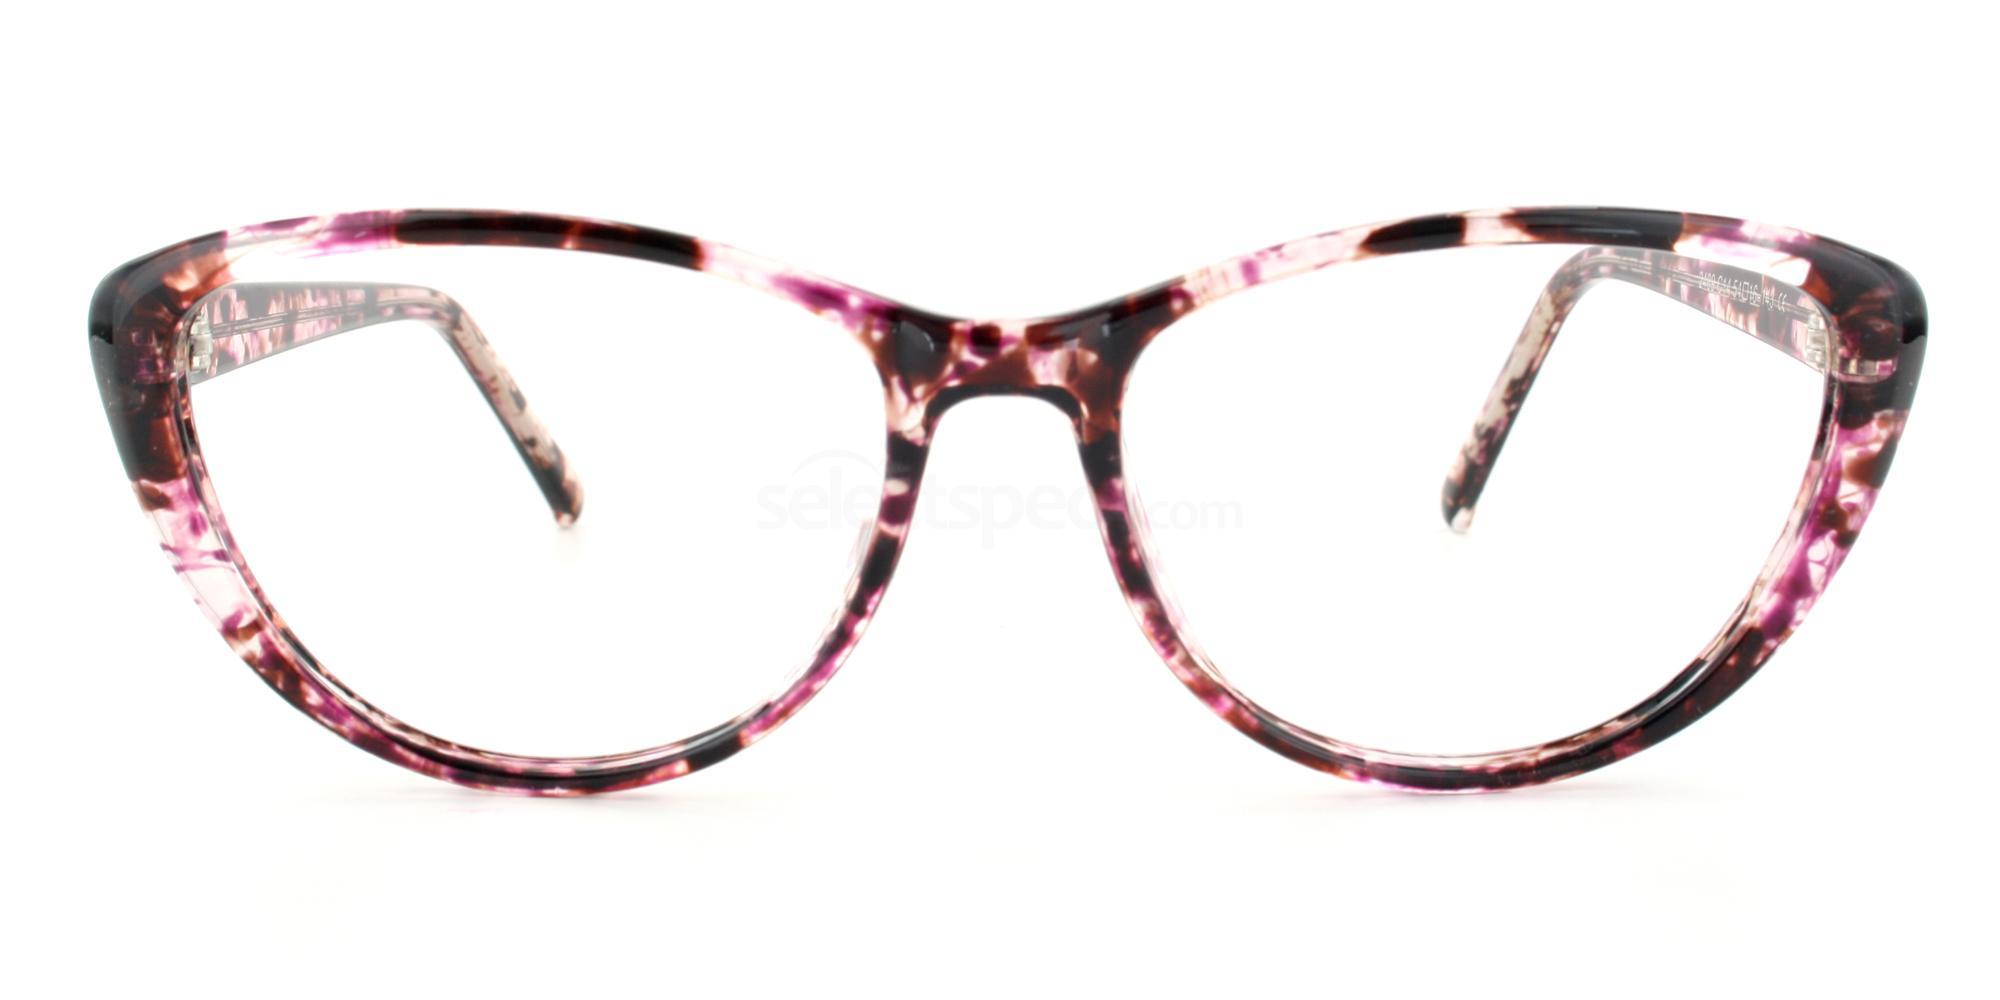 C14 2489 - Pink Demi Glasses, Savannah